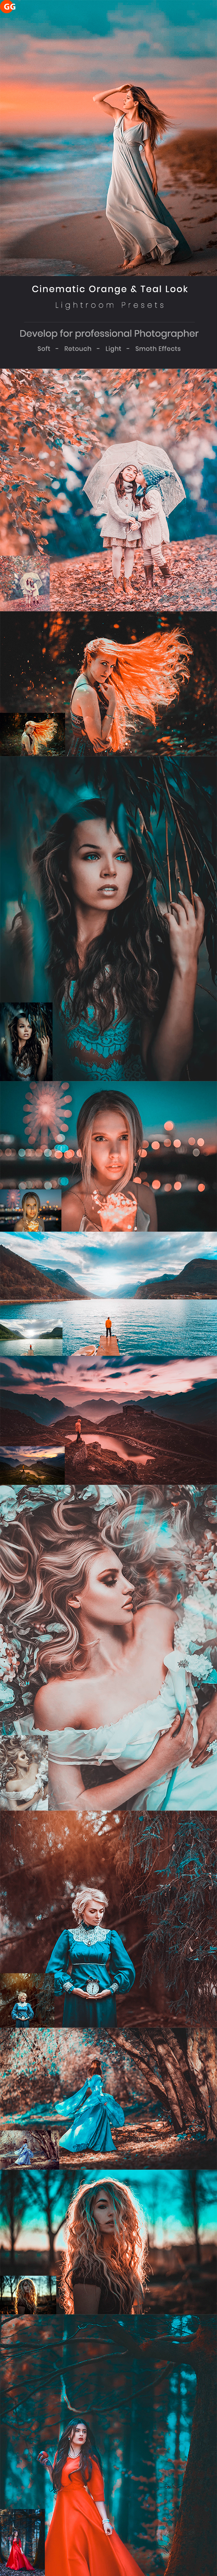 Cinematic Orange & Teal Look Lightroom Preset